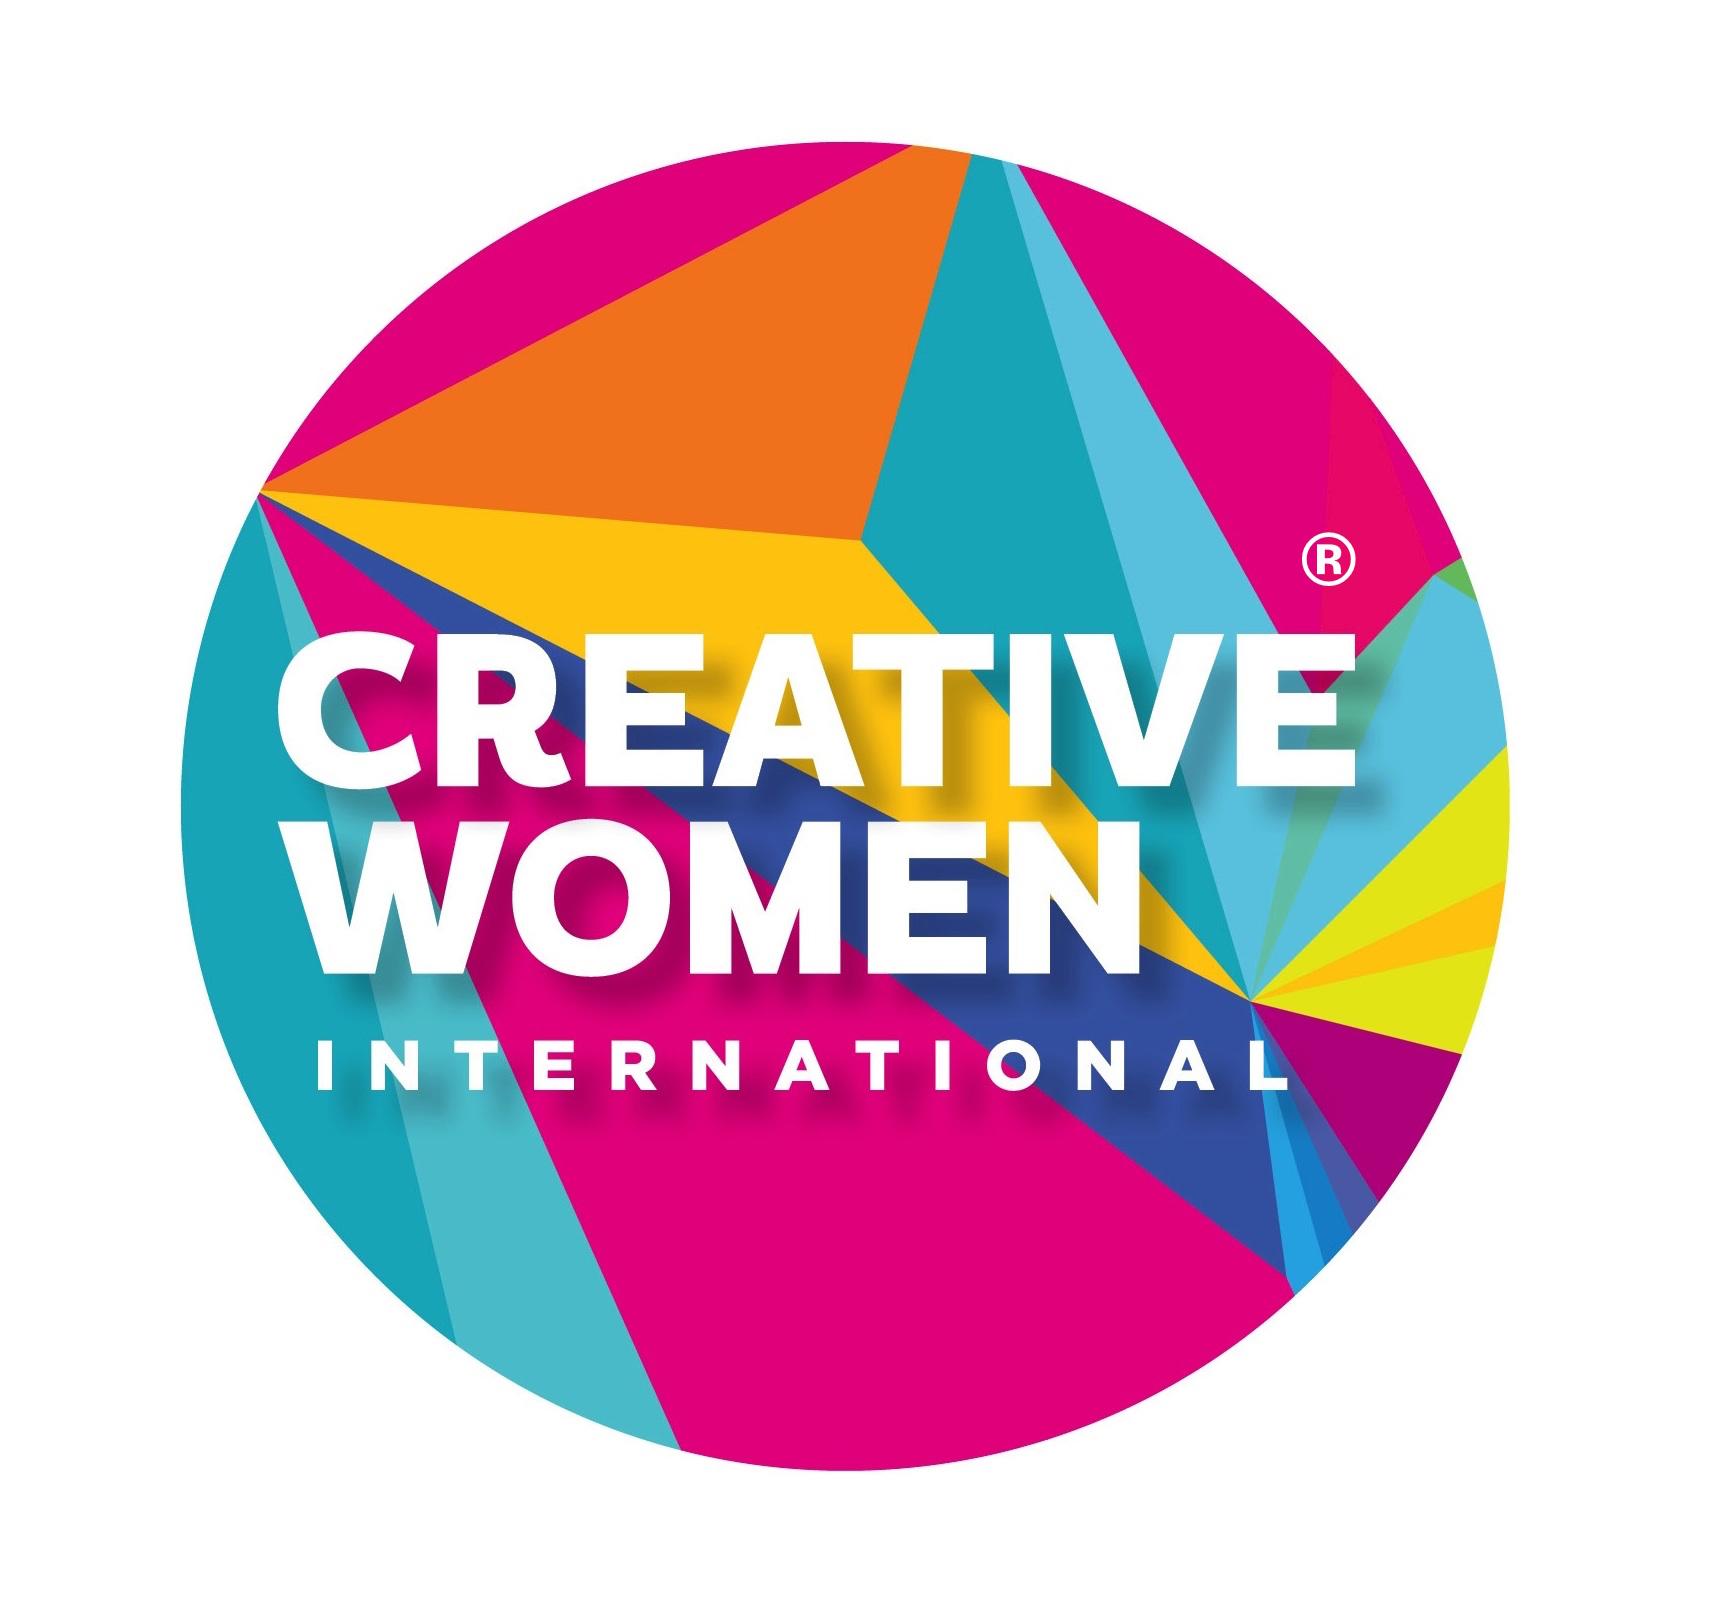 Creative Women's International